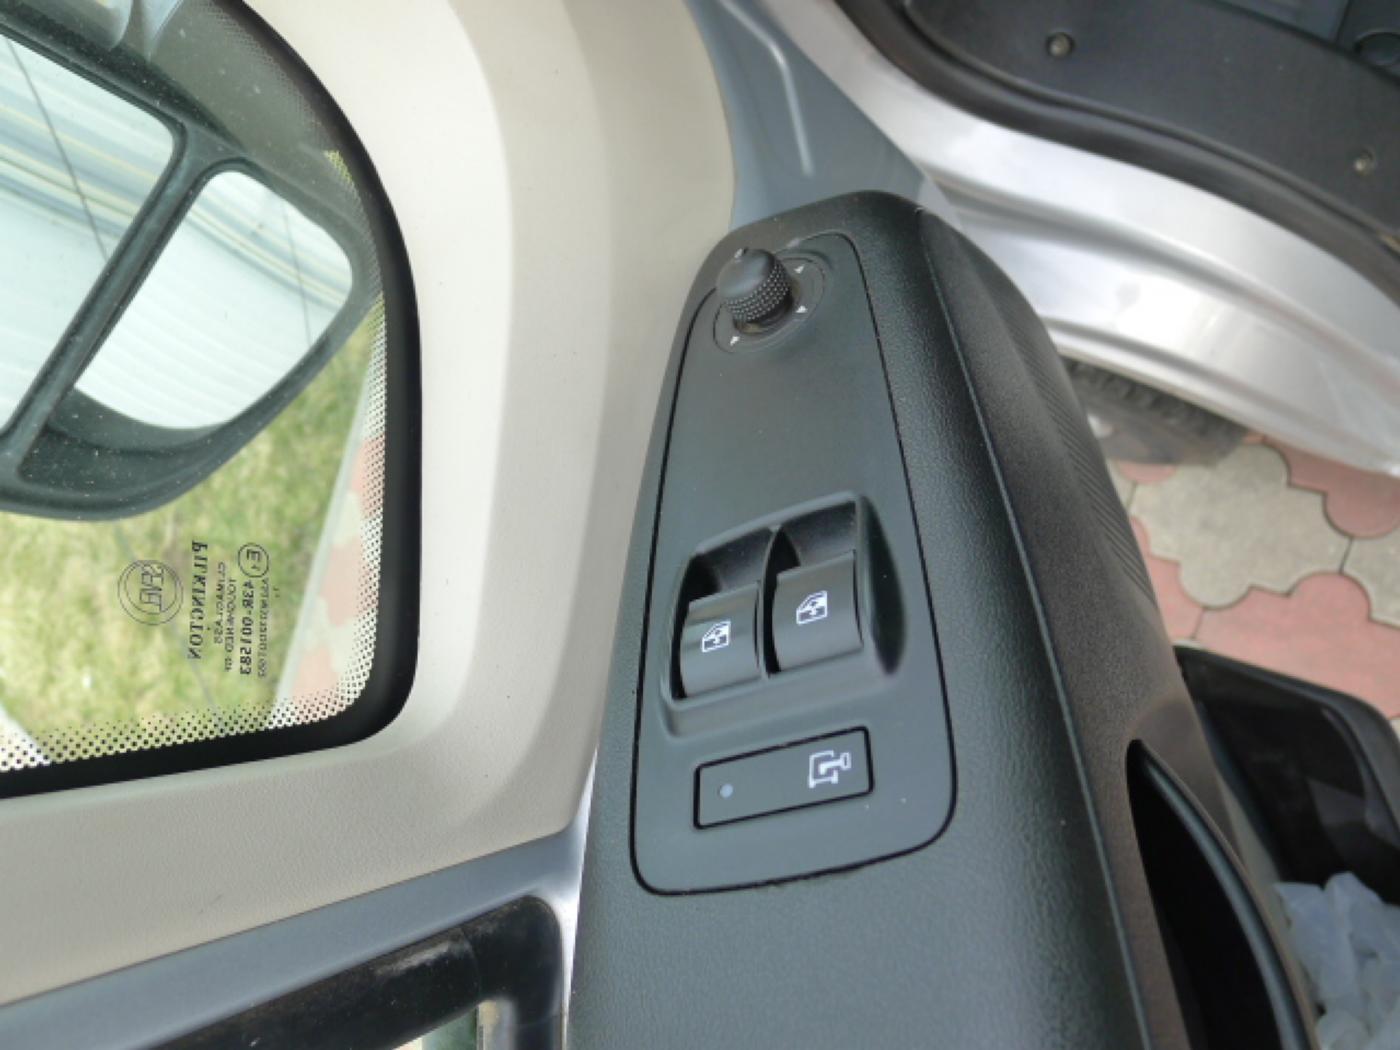 Peugeot Boxer 2,2 HDI PANORAMA 8míst+2 x klima+We - 17